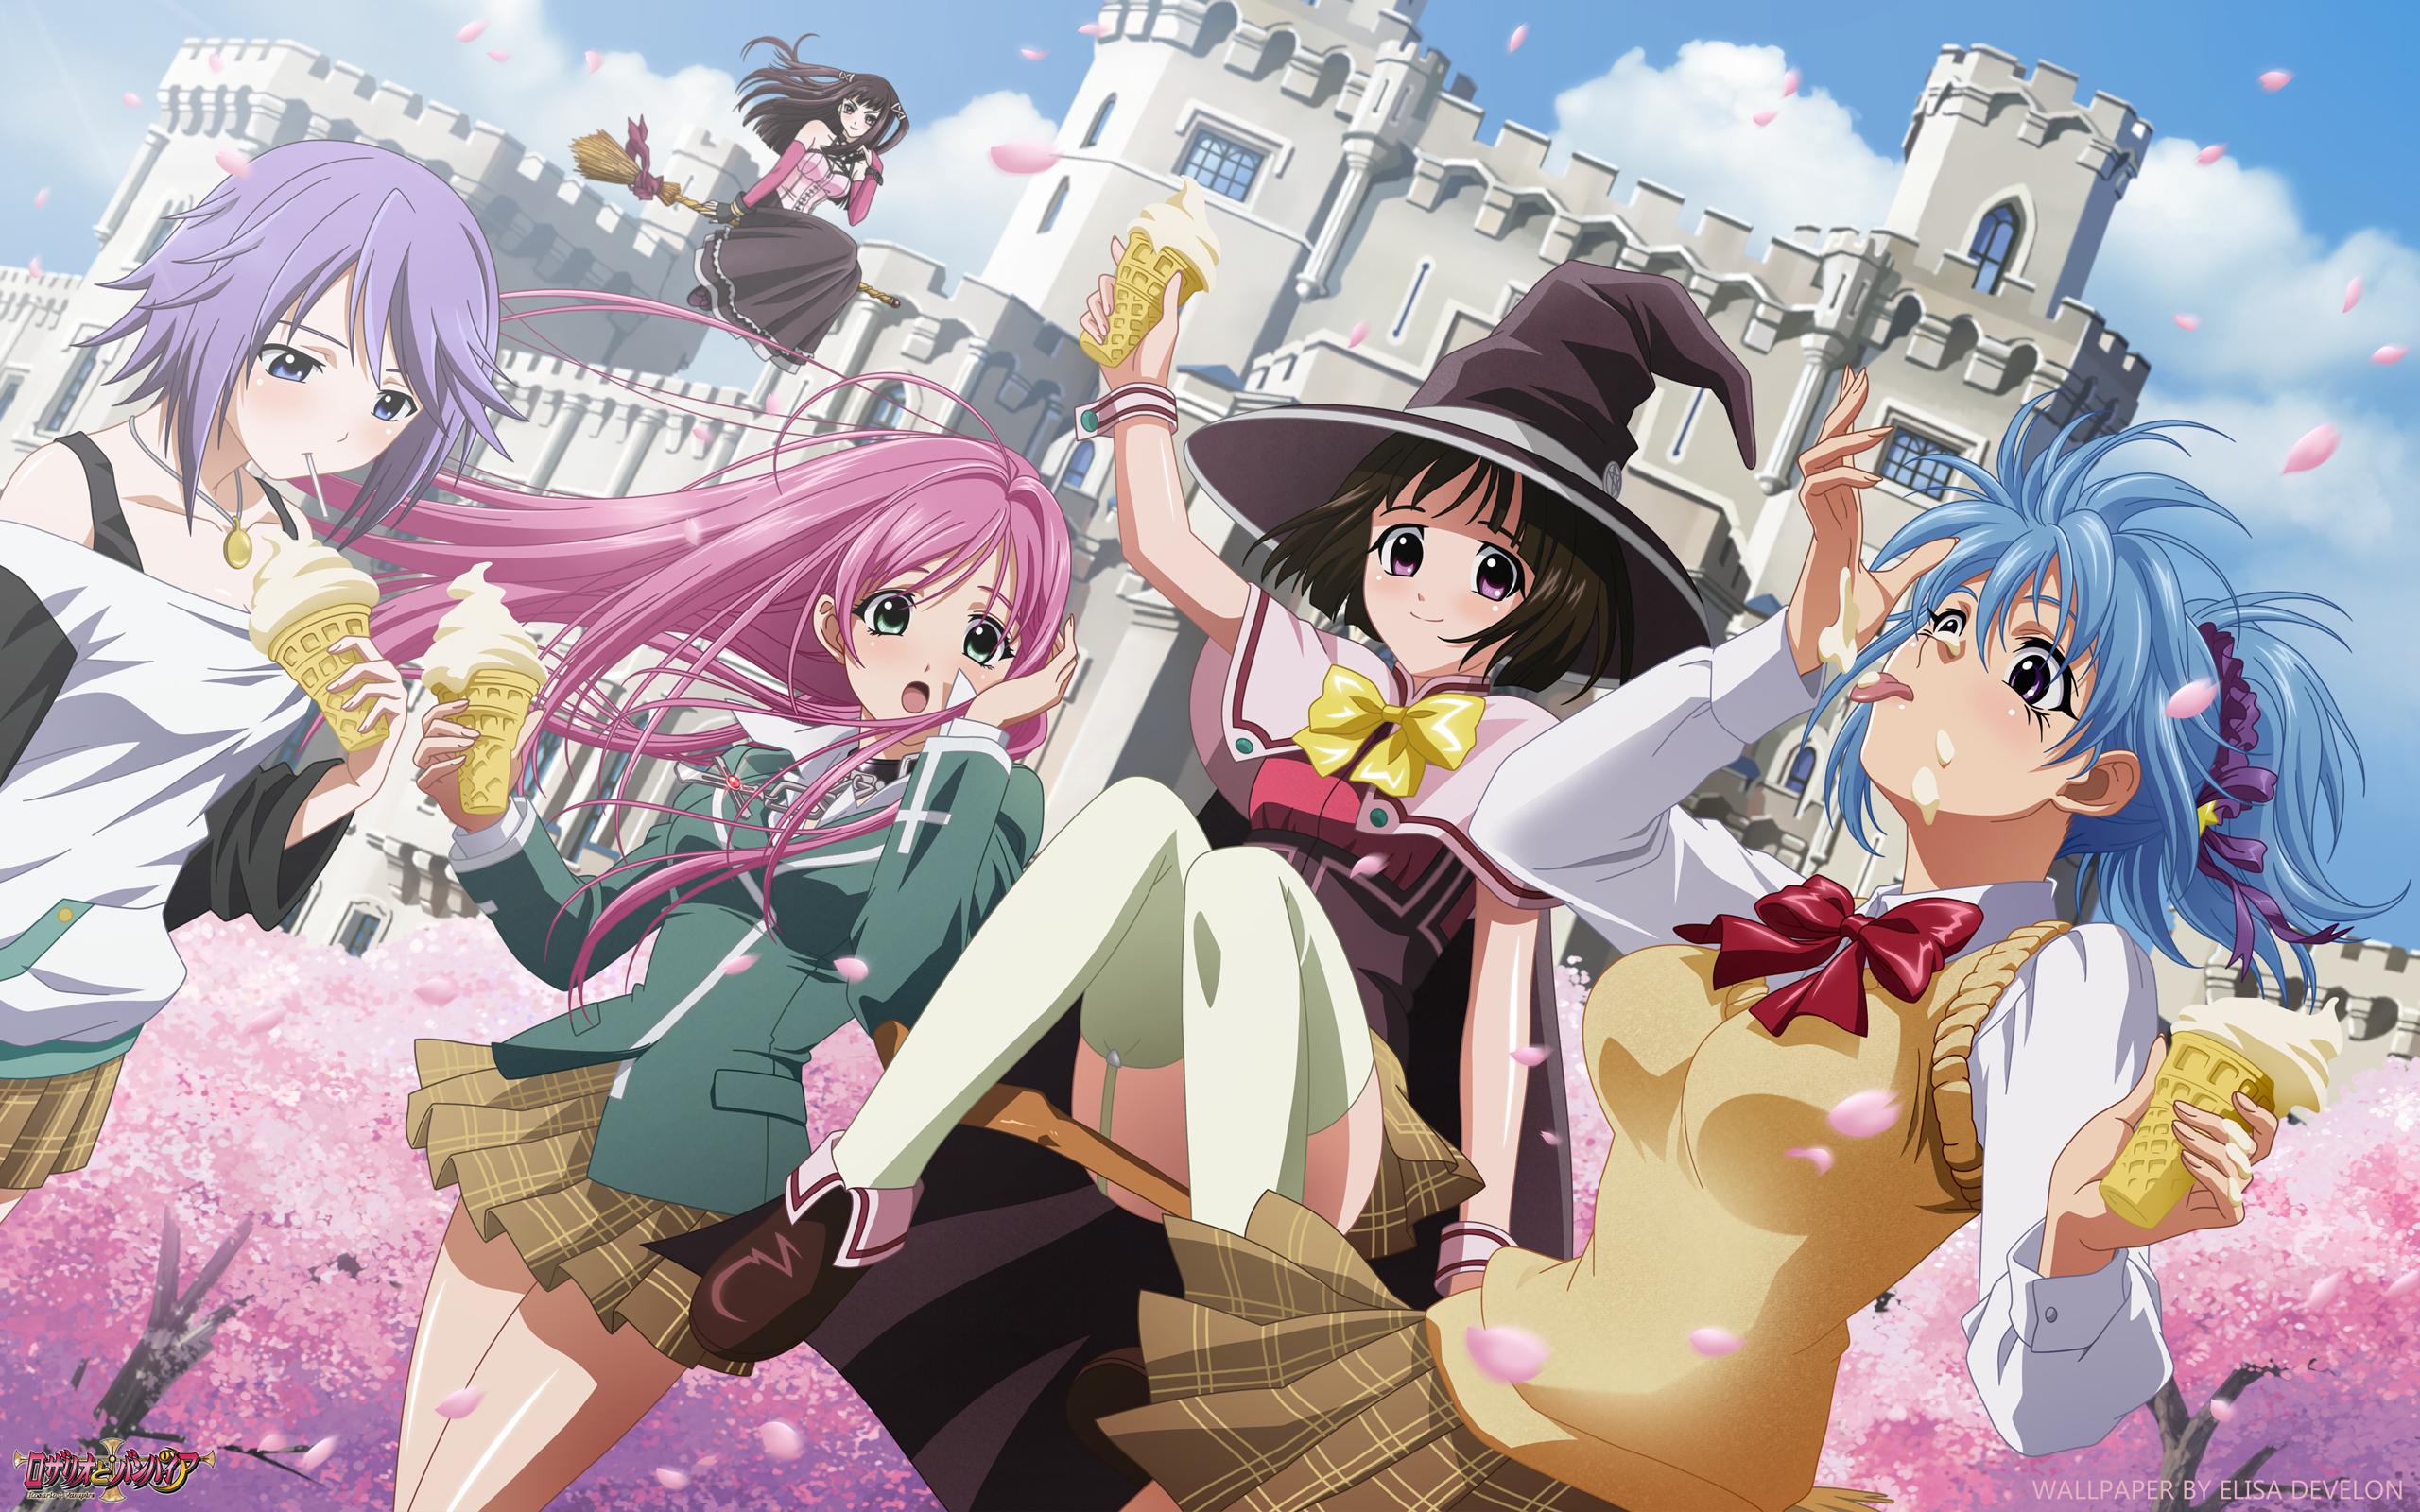 Image Result For Anime Wallpaper Rosario Vampire